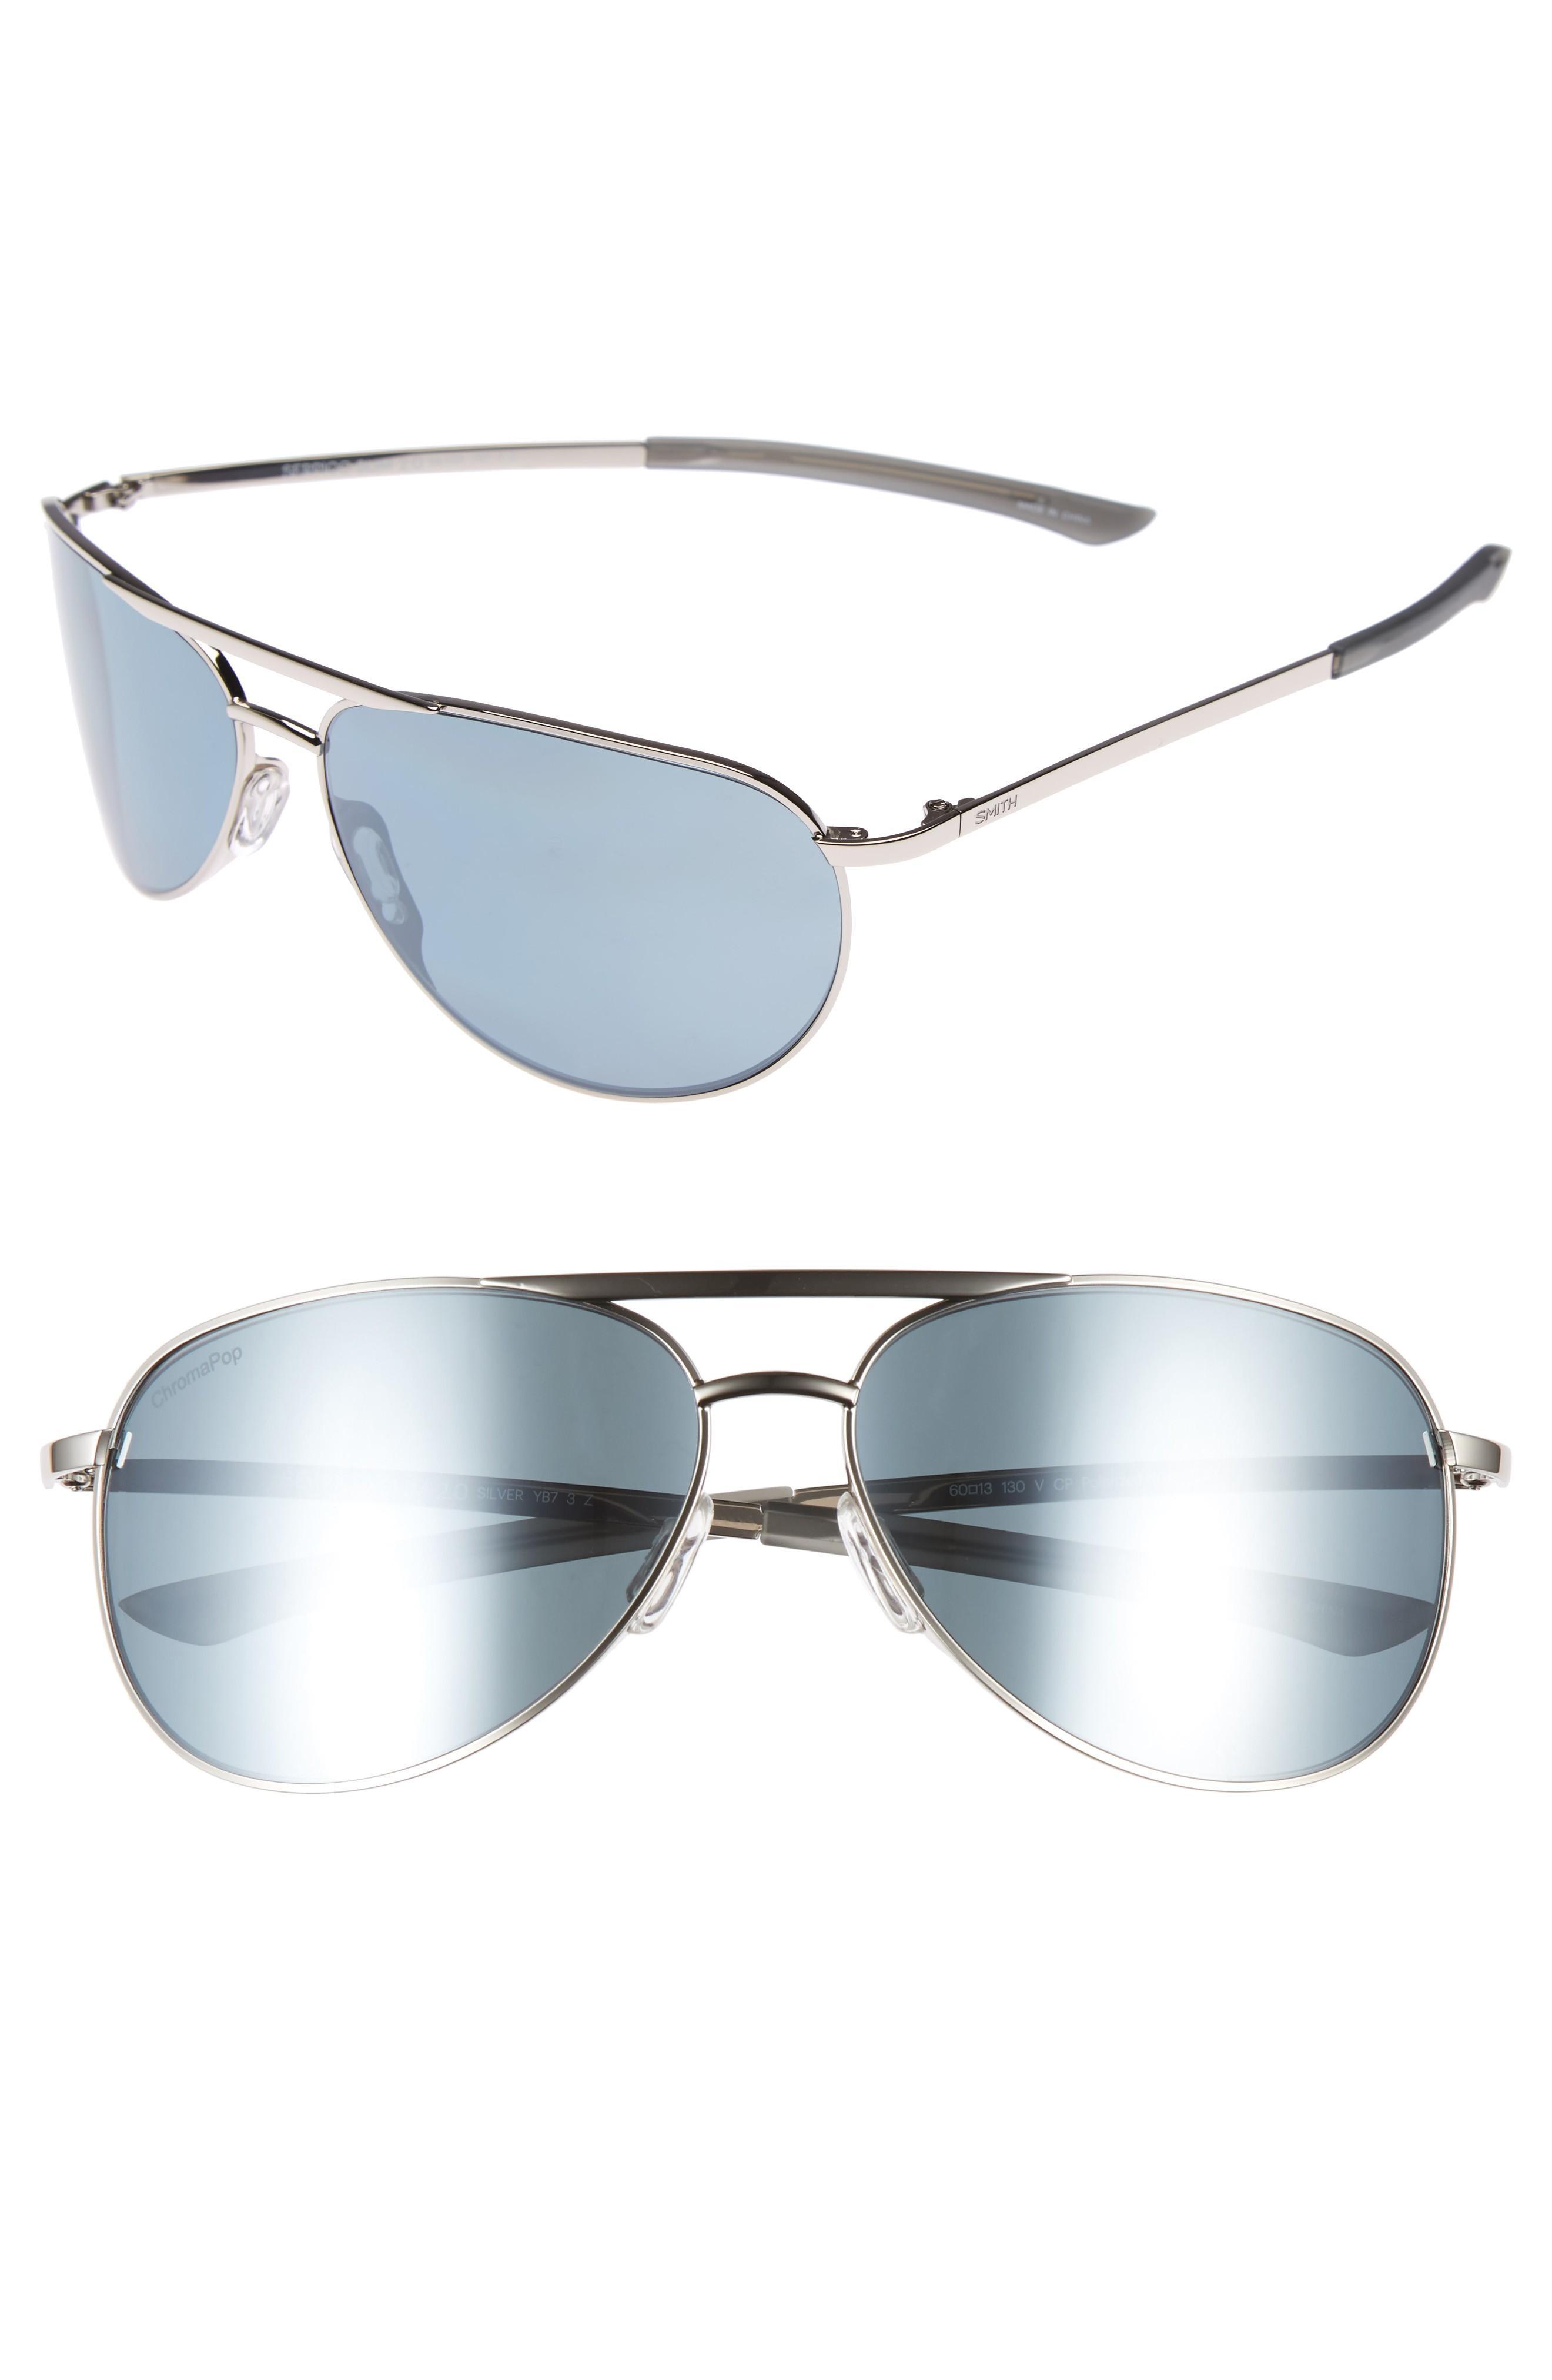 b503f95b10 Smith Serpico Slim 2.0 60Mm Chromapop Polarized Aviator Sunglasses ...